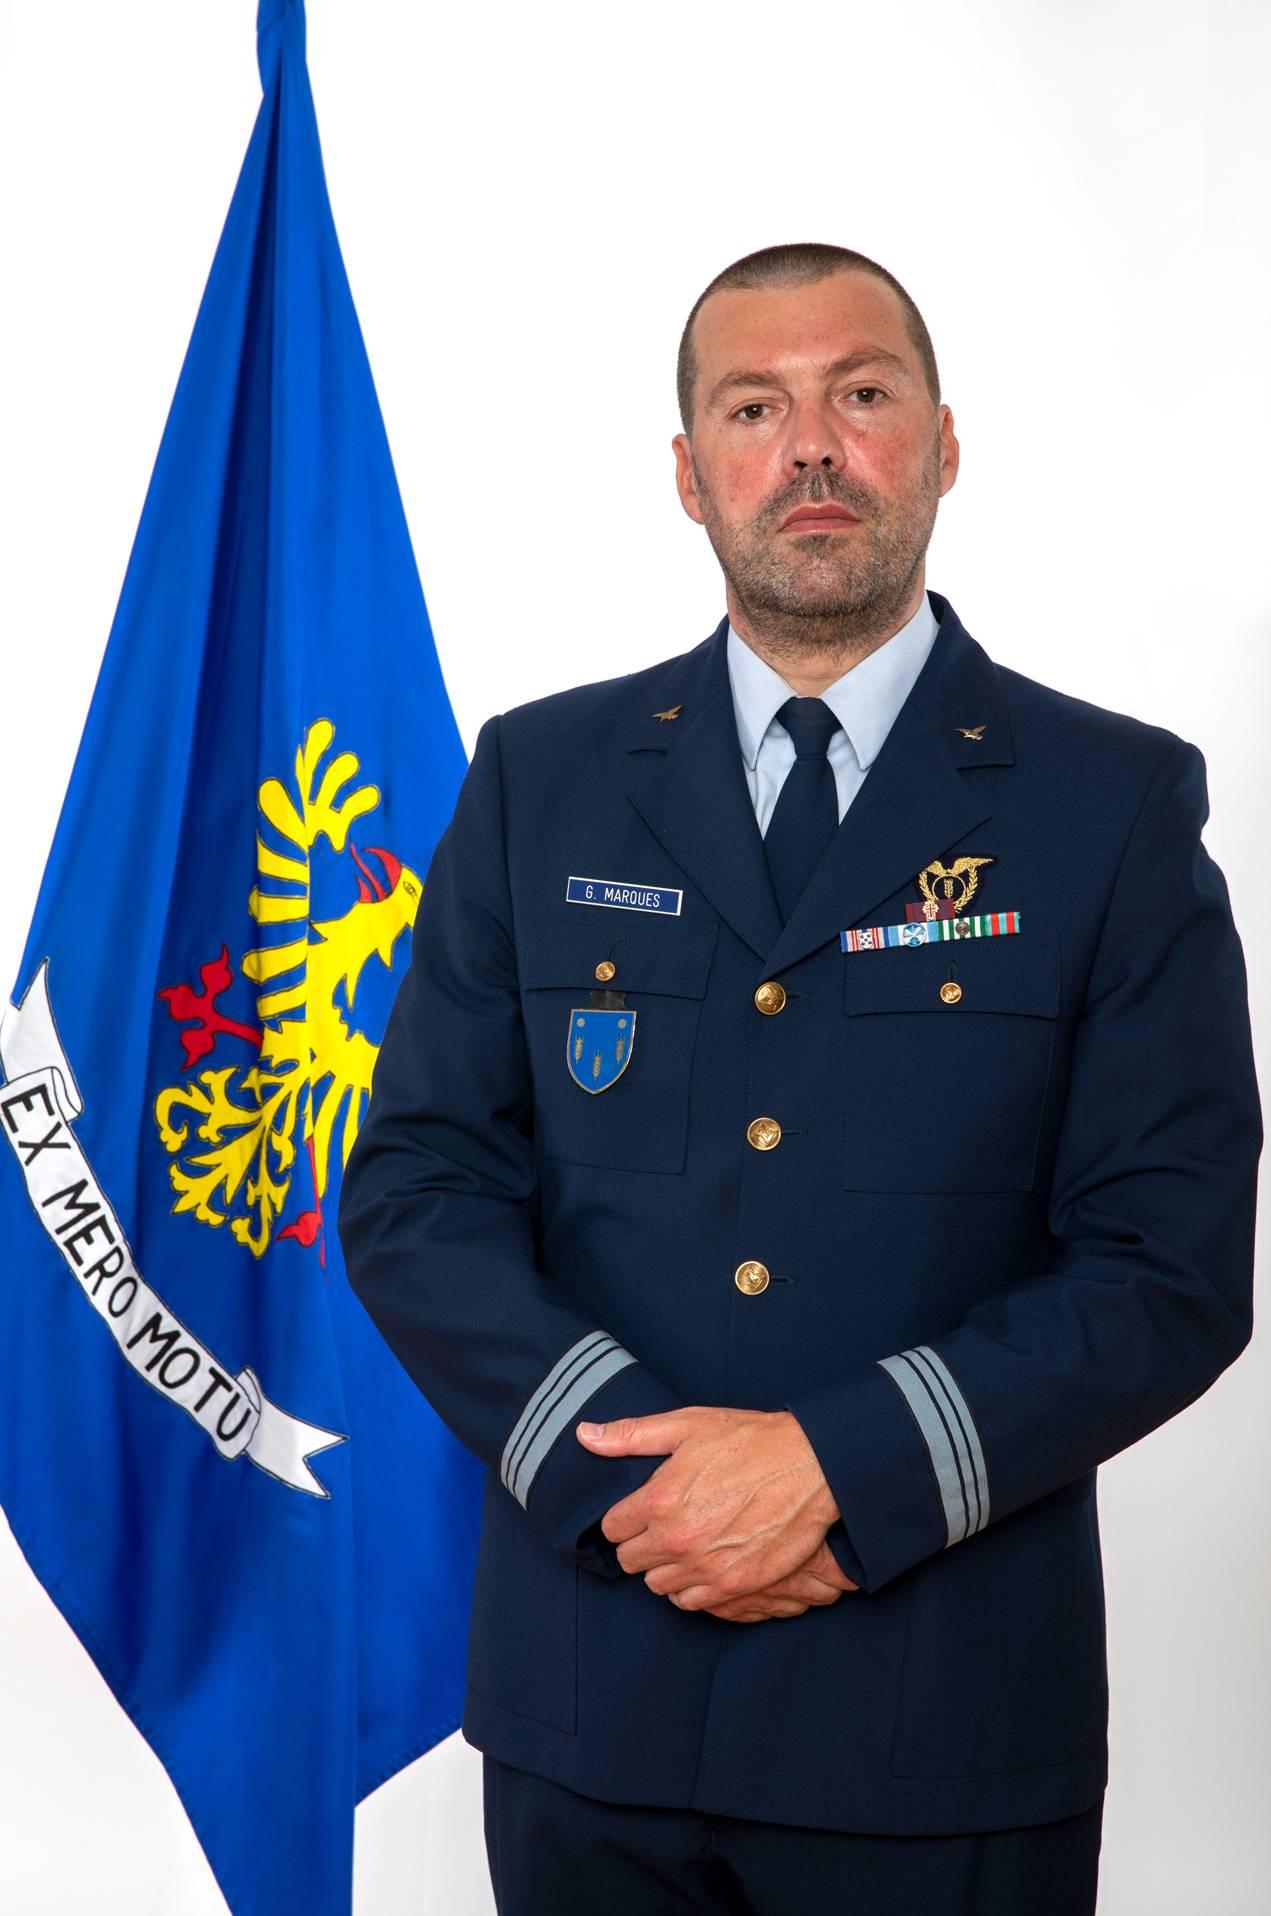 Gilberto Lopes Marques